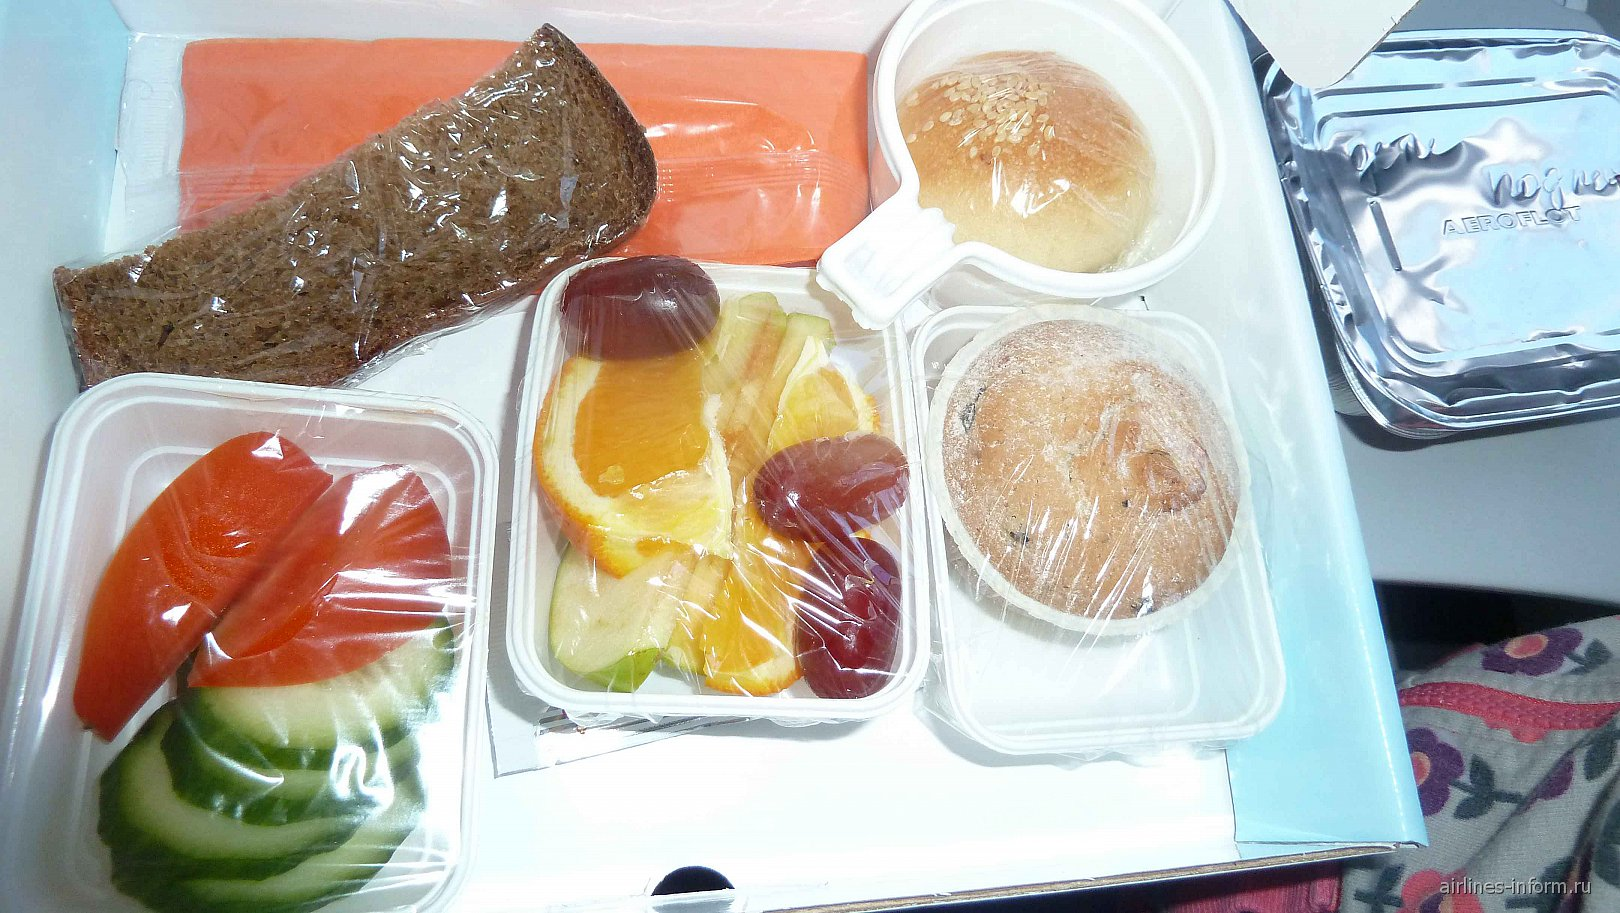 Питание на рейсе Аэрофлота Петропавловск-Камчатский-Москва